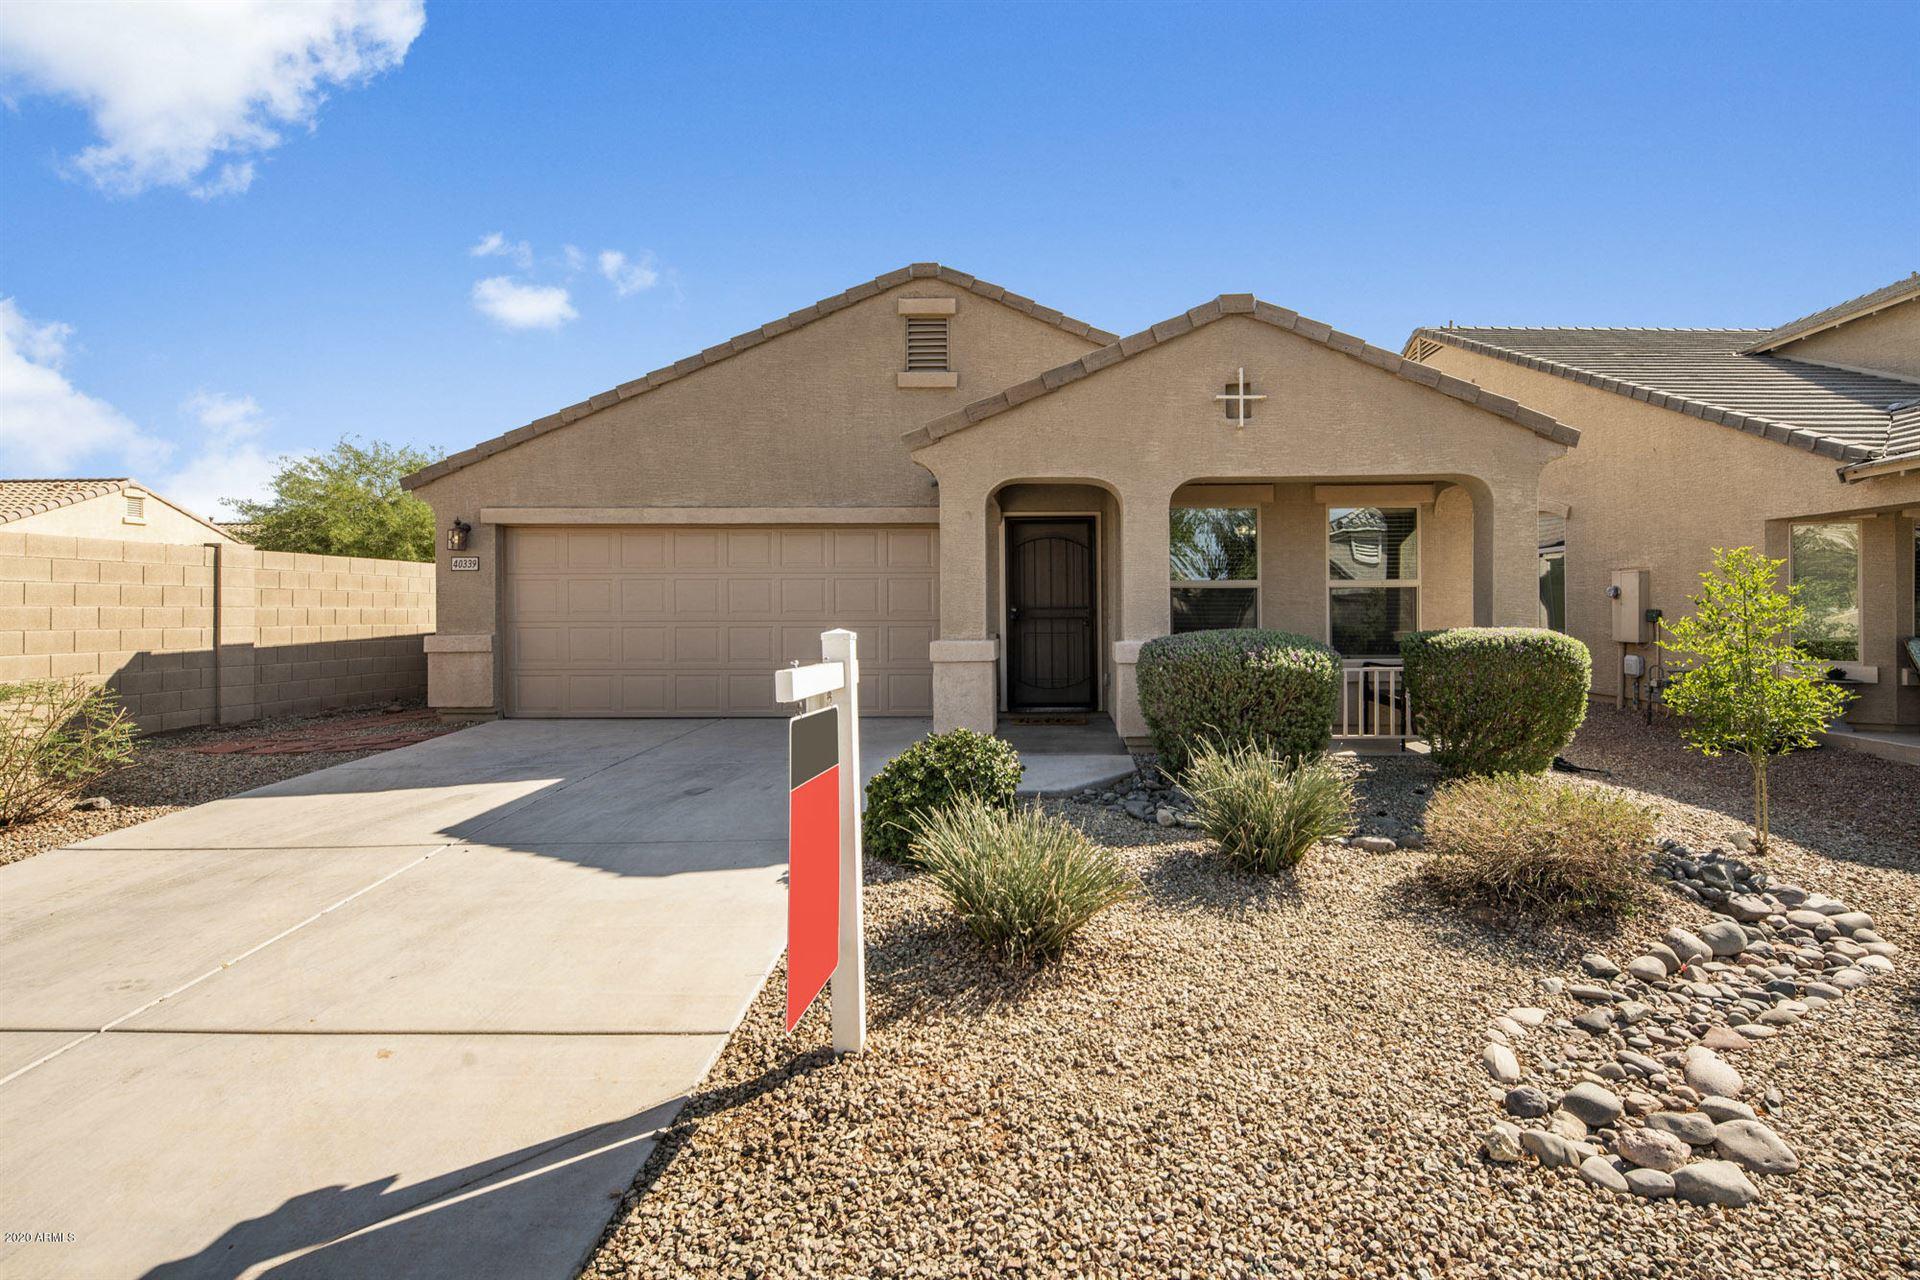 40339 W HOPPER Drive, Maricopa, AZ 85138 - MLS#: 6137639